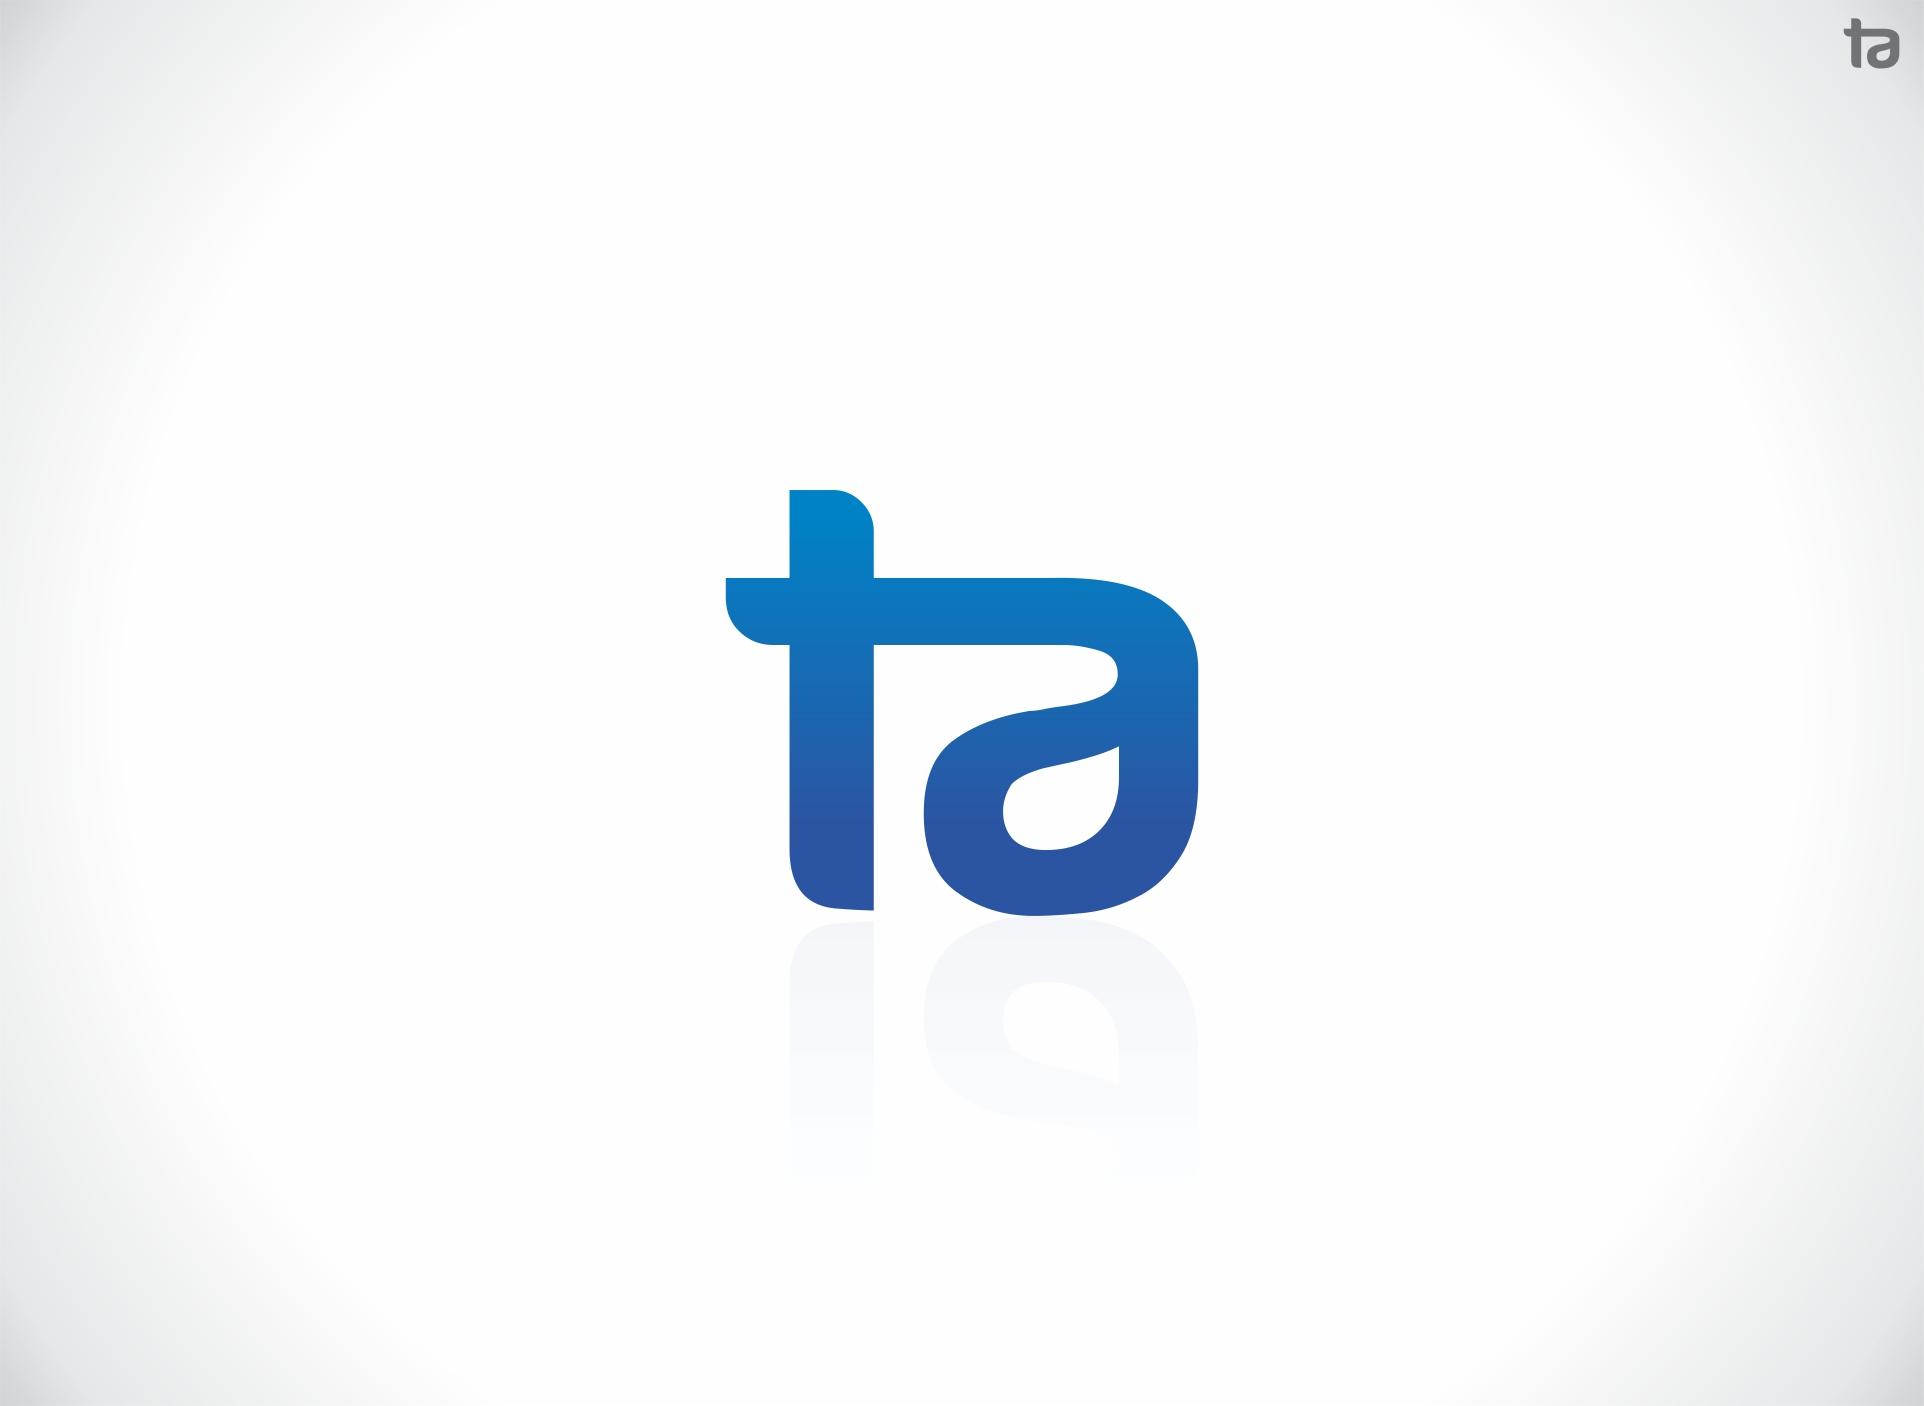 Logo Design by dandor - Entry No. 68 in the Logo Design Contest Imaginative Logo Design for TAYA.